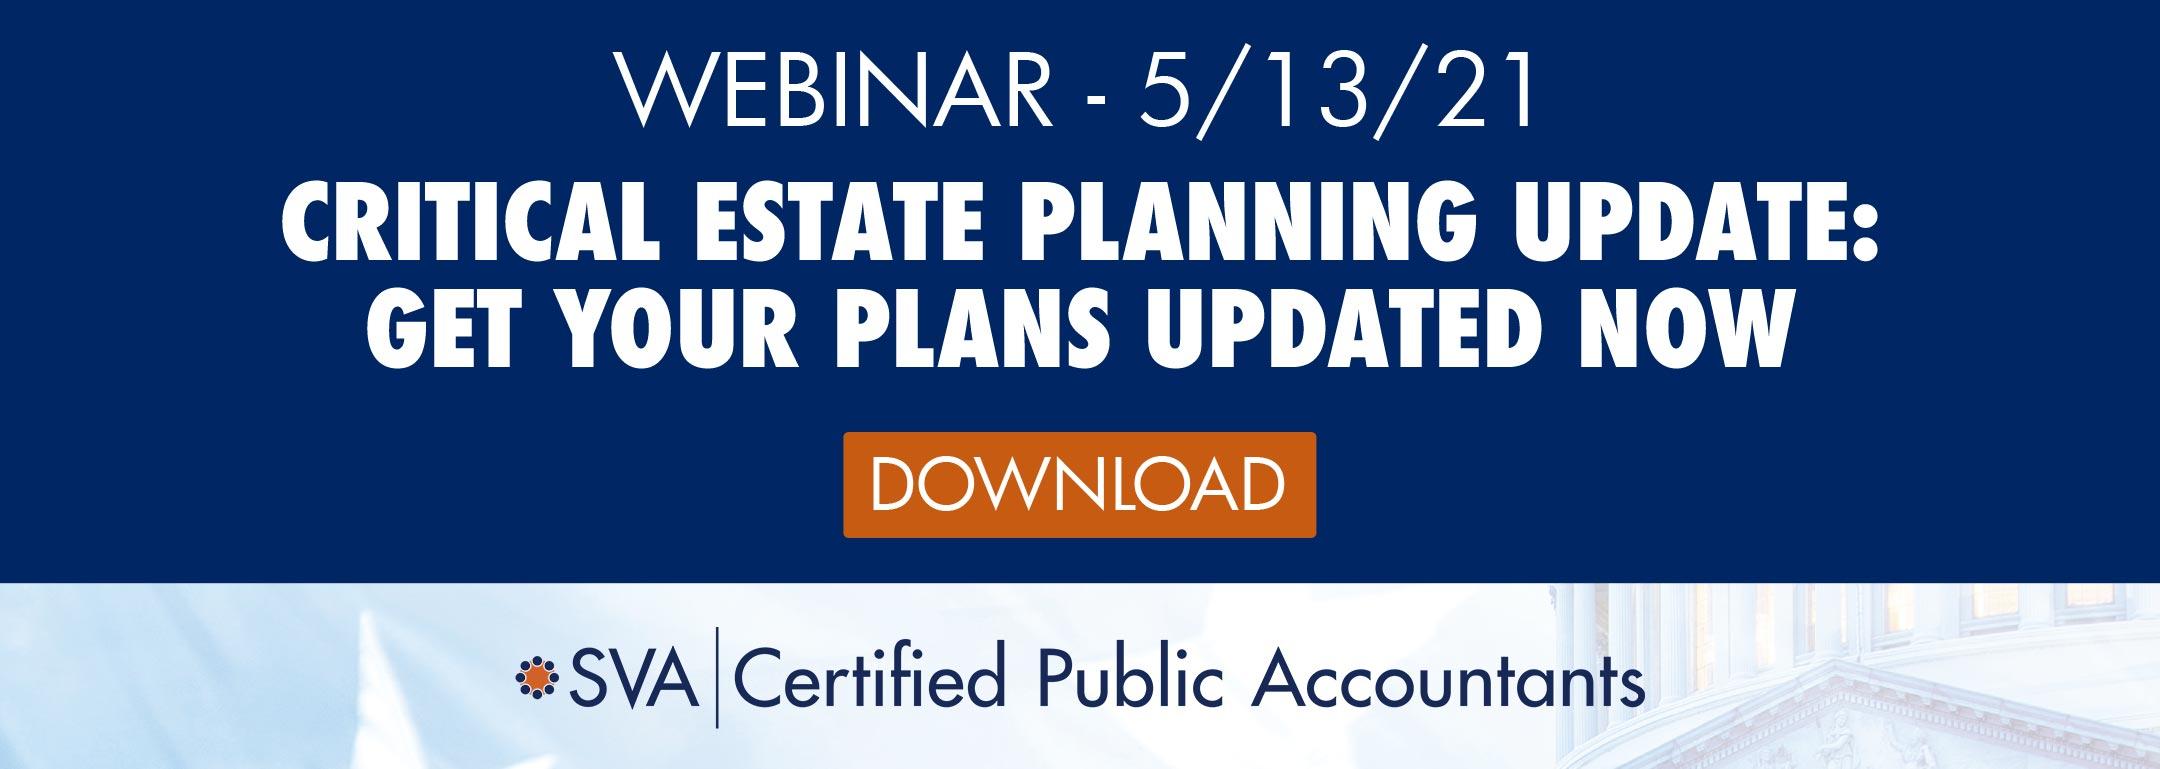 Critical Estate Planning Update